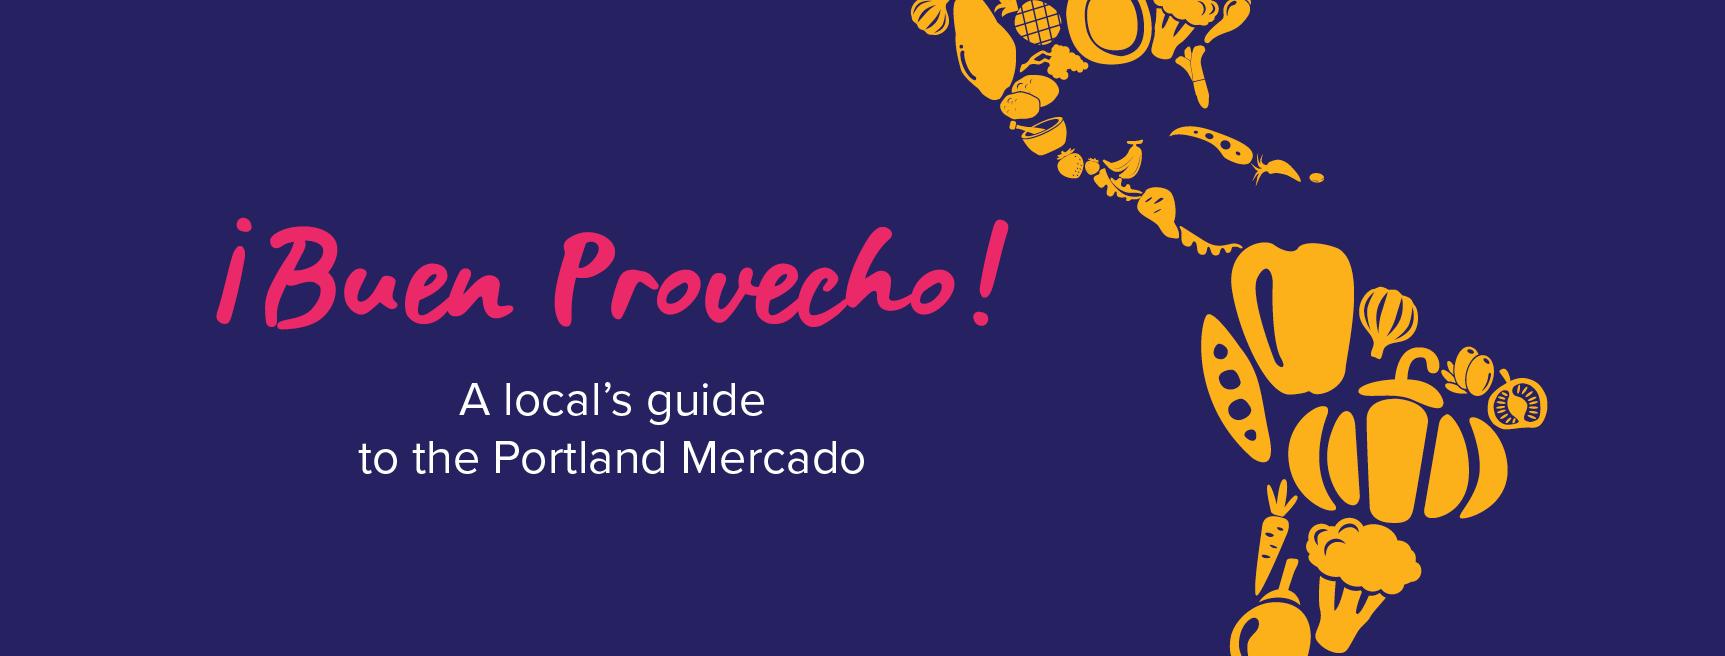 ¡Buen Provecho! A local's guide to the Portland Mercado